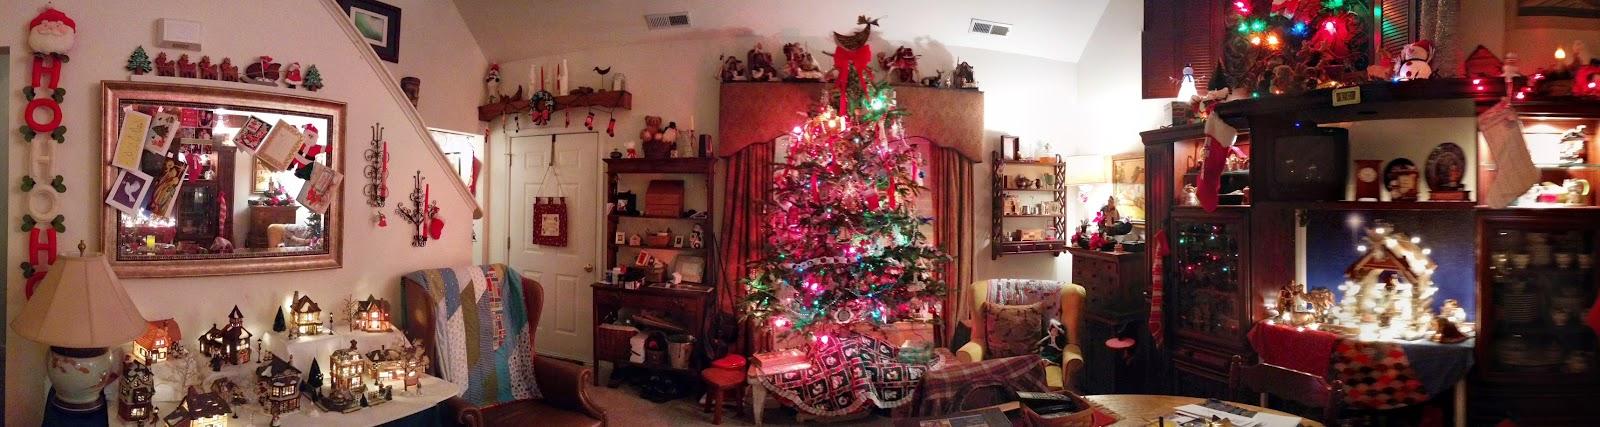 The House That Threw-Up Christmas via foobella.blogspot.com